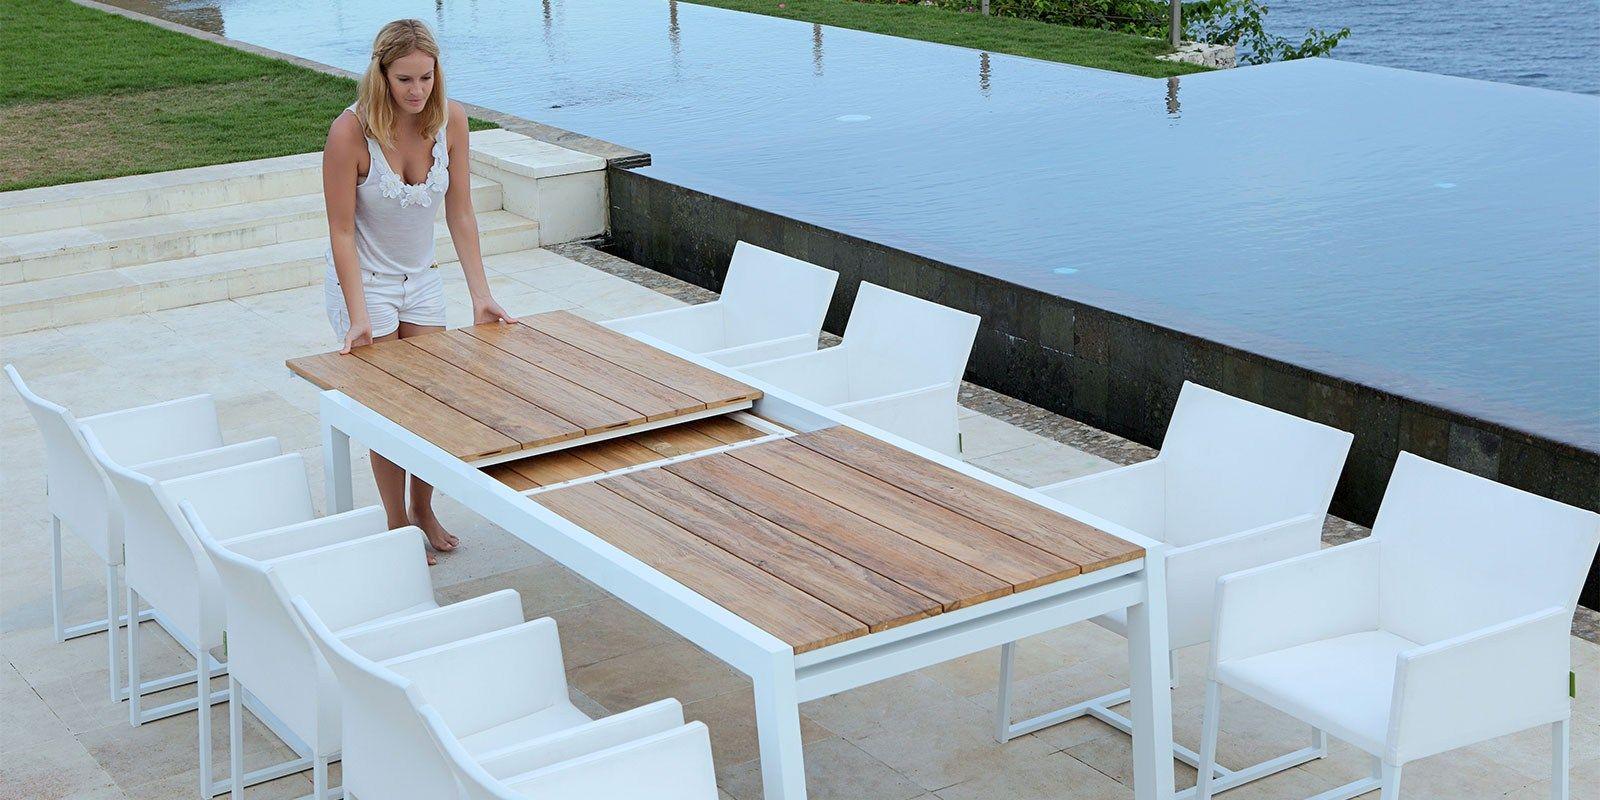 Stunning Tavoli Da Terrazzo Images - Idee Arredamento Casa - hirepro.us